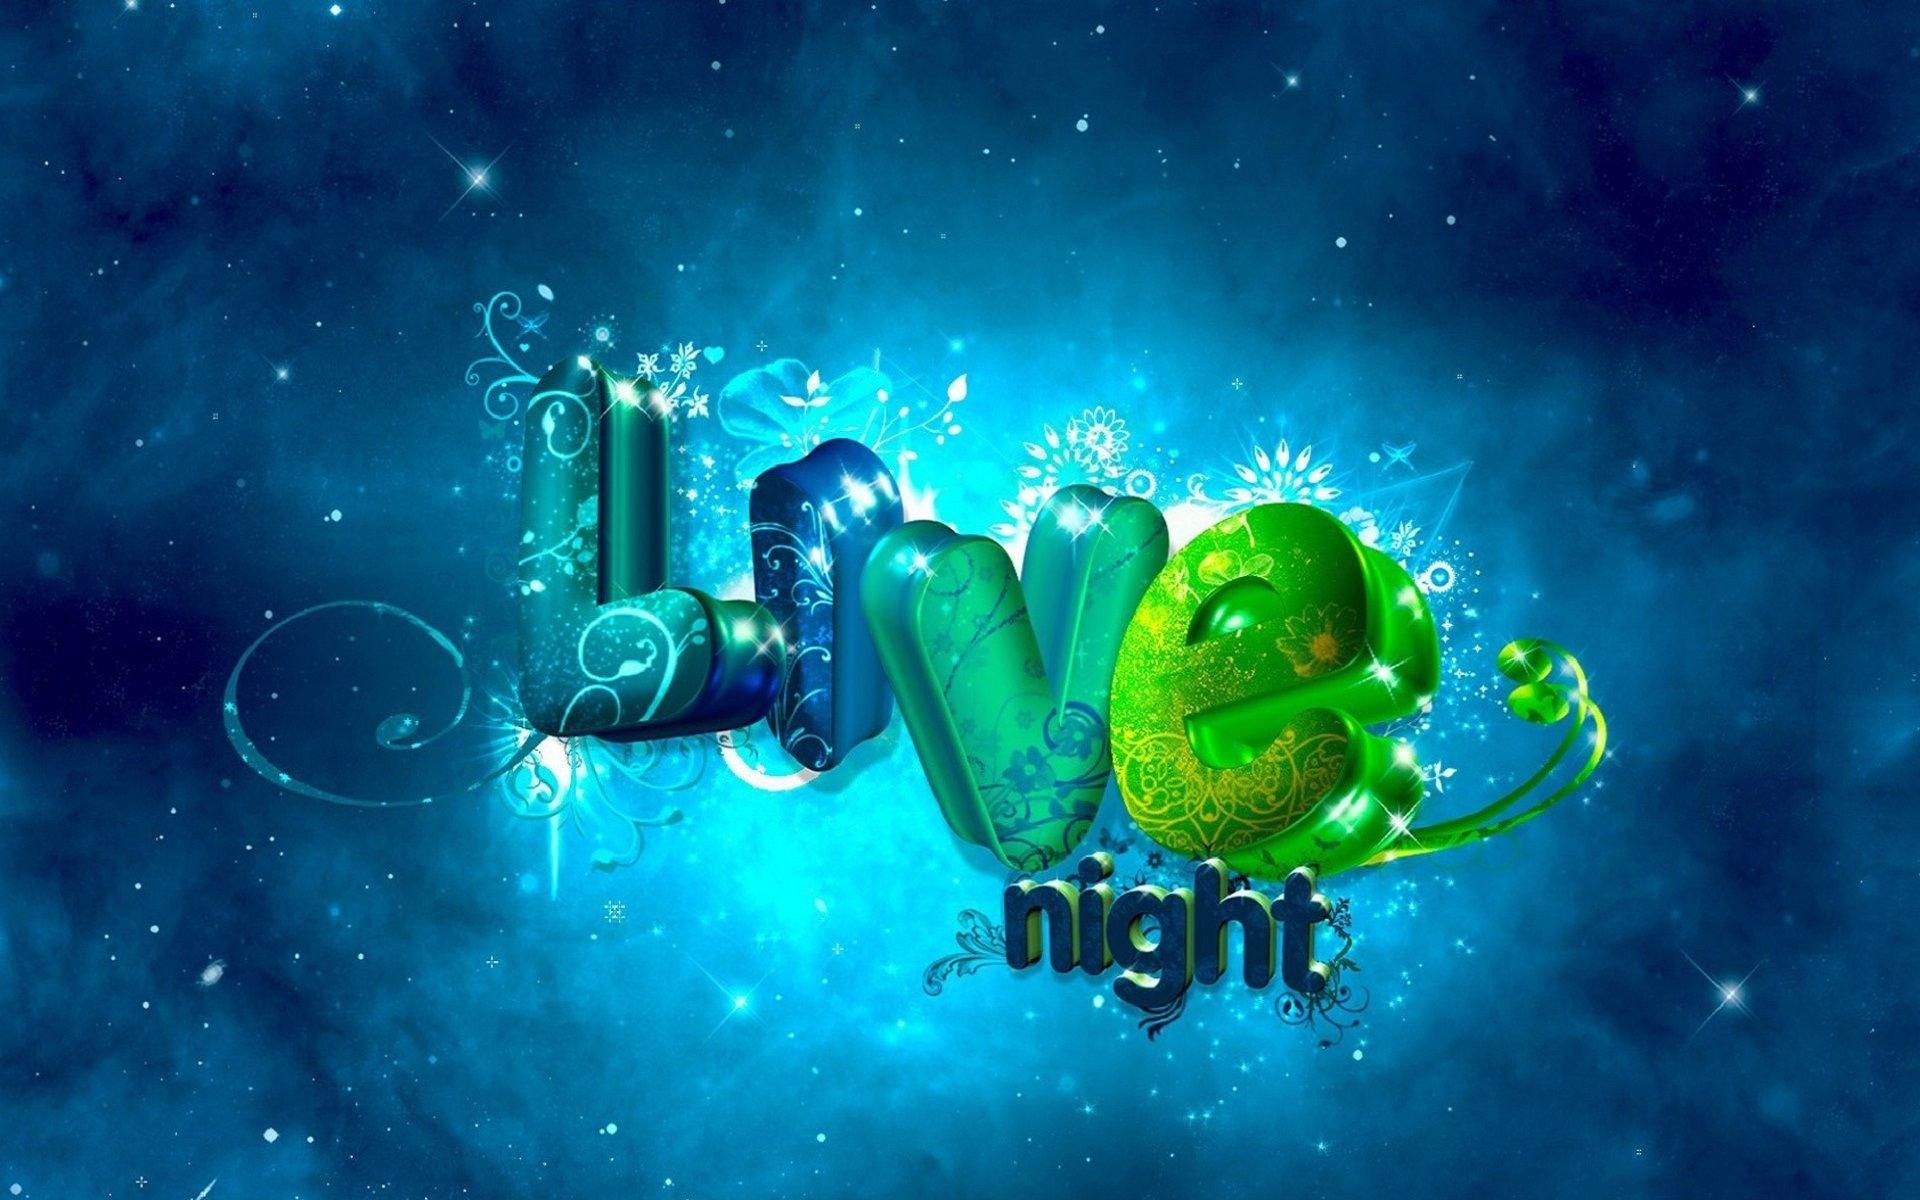 Wallpaper download good night - Live Good Night Hd Wallpaper Hd Wallpapers Rocks